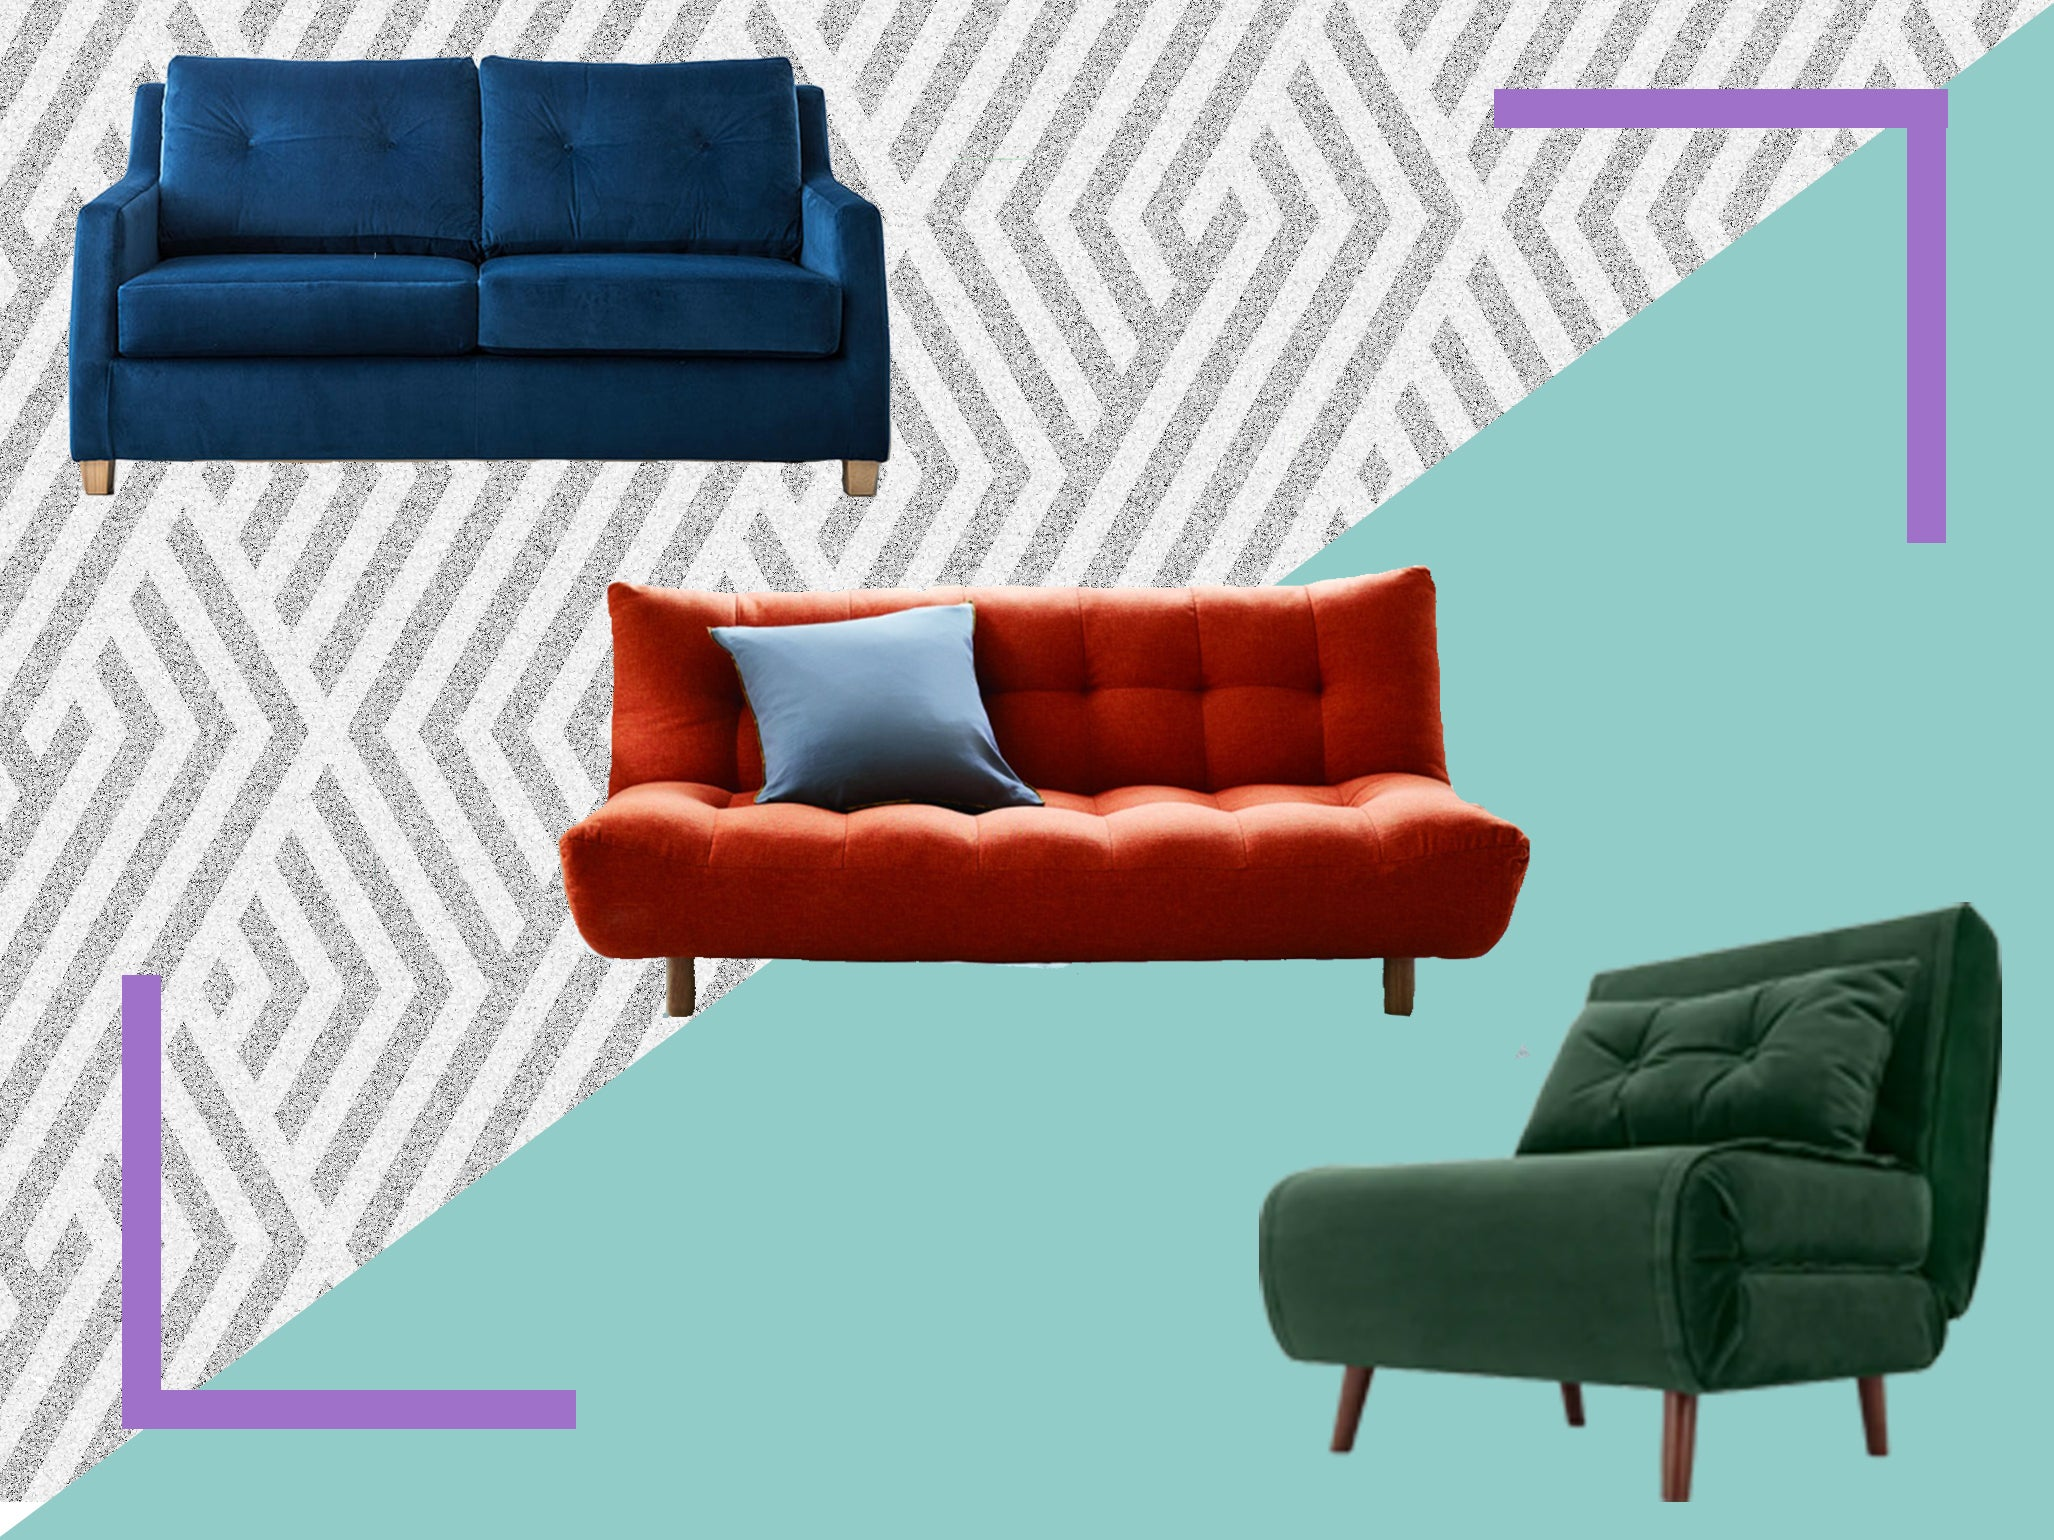 Luxury Futon Bed Wooden Frame Guest Sofa Bed Folding Mattress Single Green